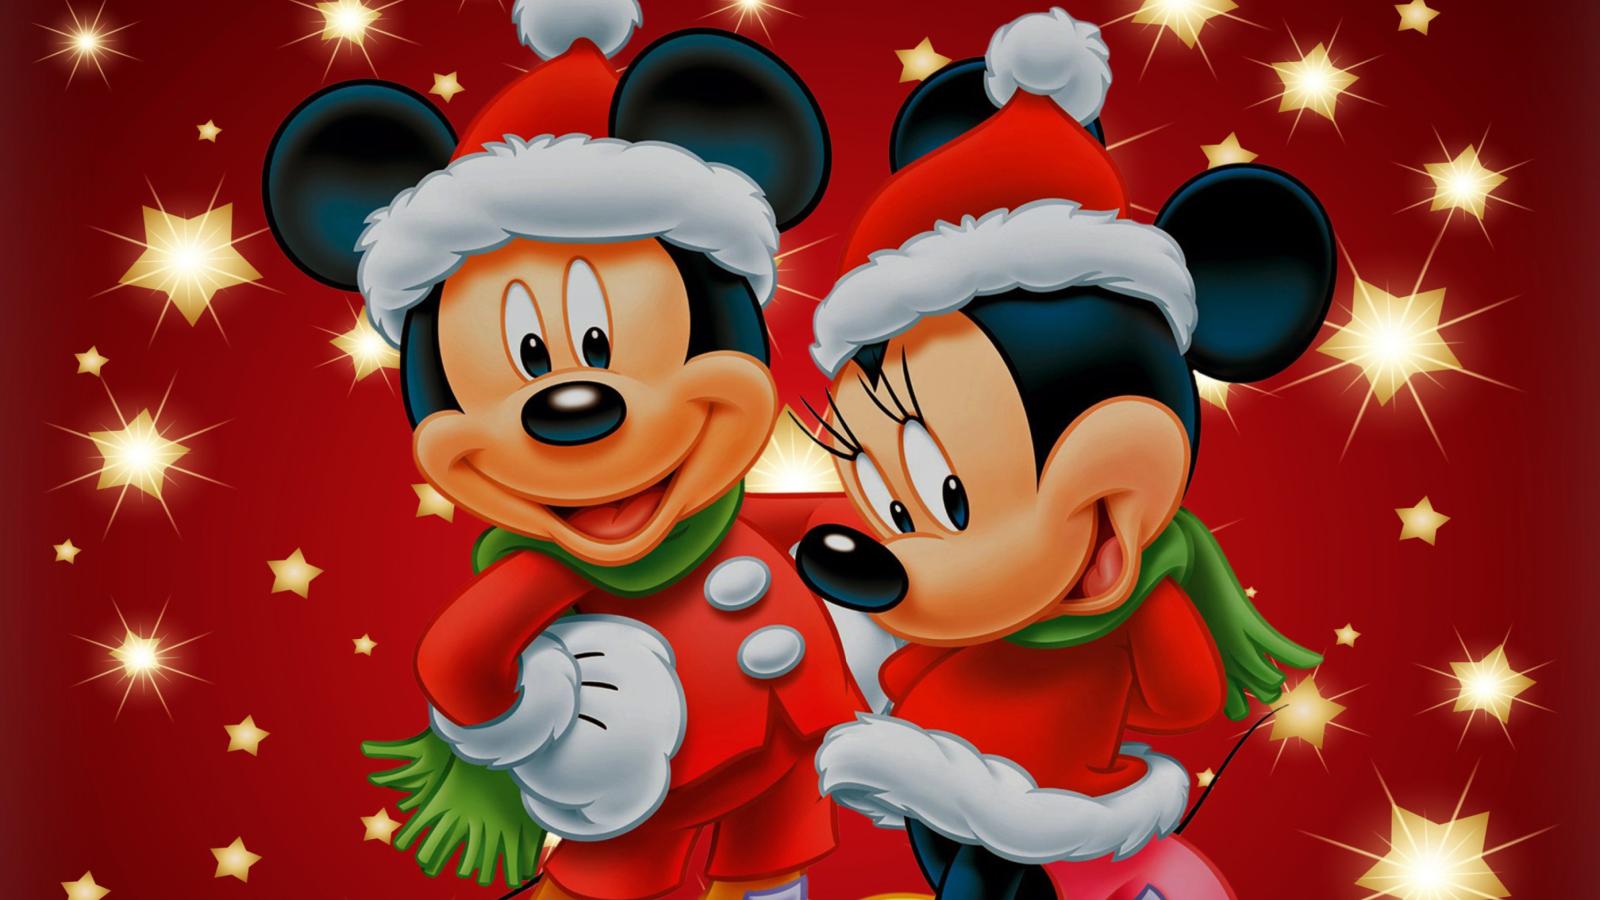 Mini Mouse Christmas Time Wallpaper for Widescreen Desktop PC 1600x900 1600x900